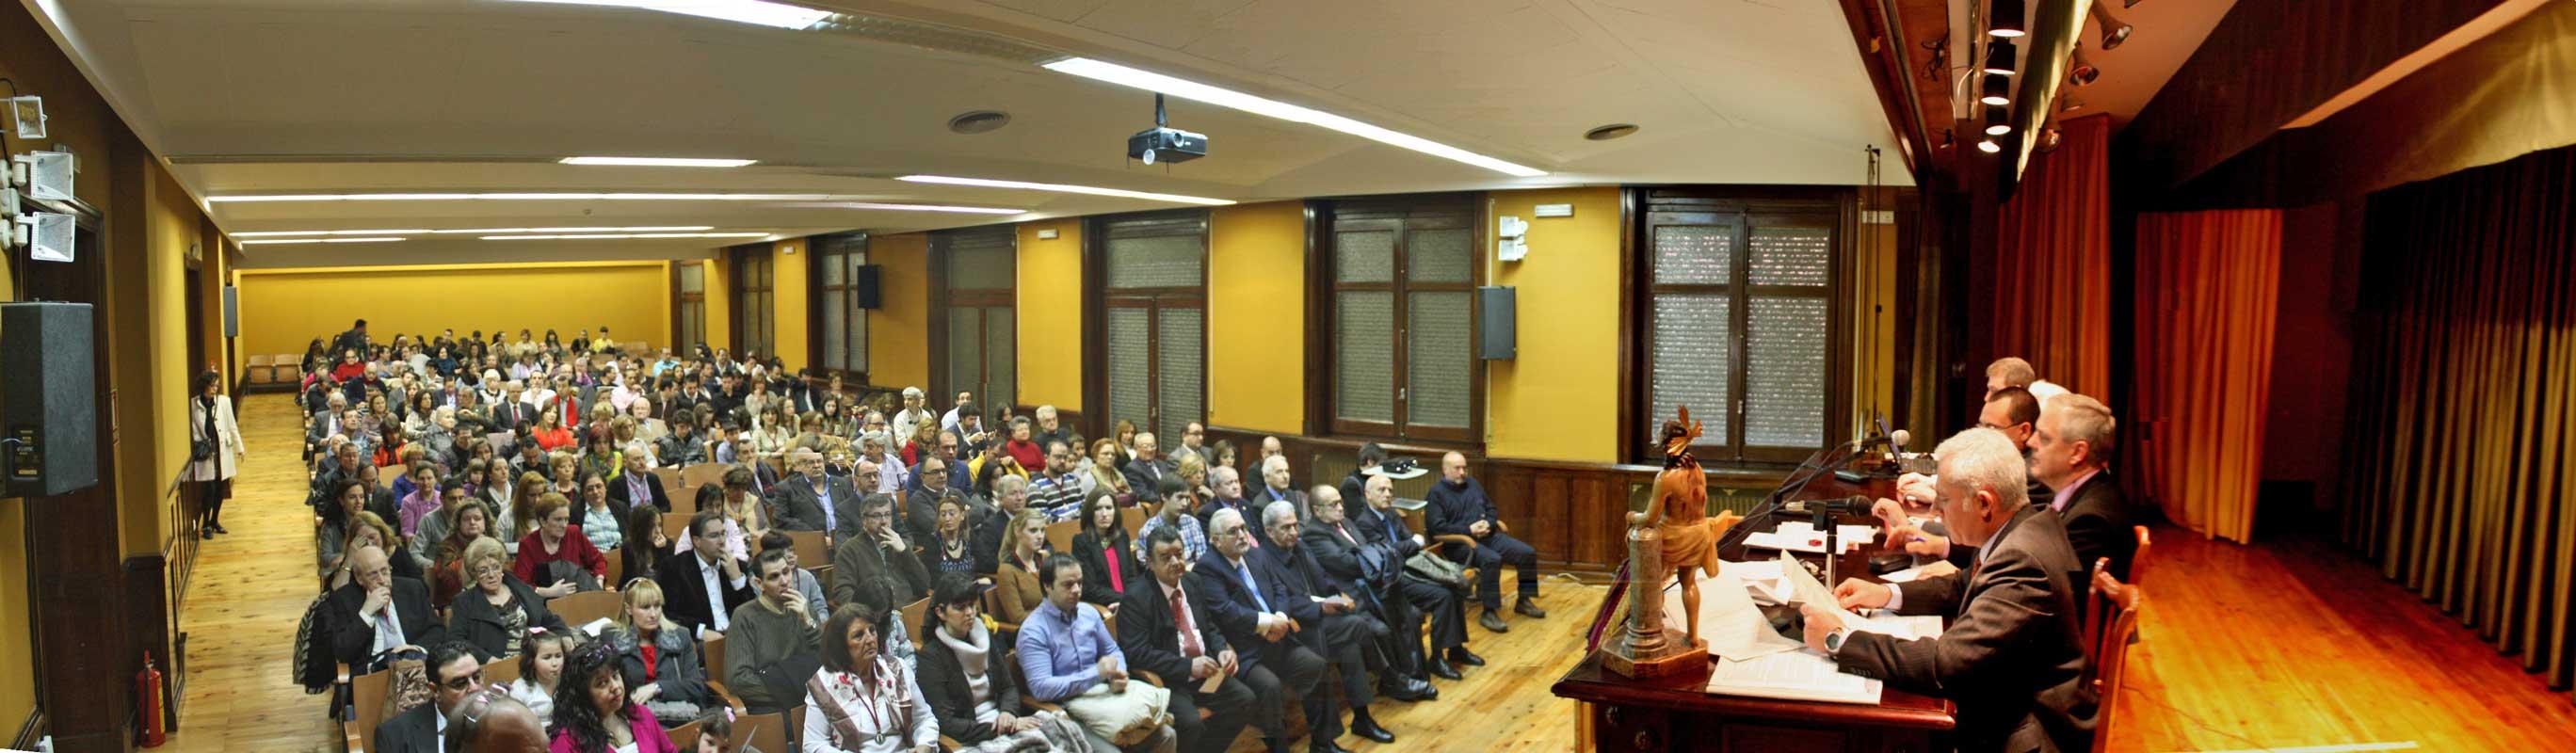 Cofradia Columna Zaragoza – Capitulo 2013—PANORAMICA